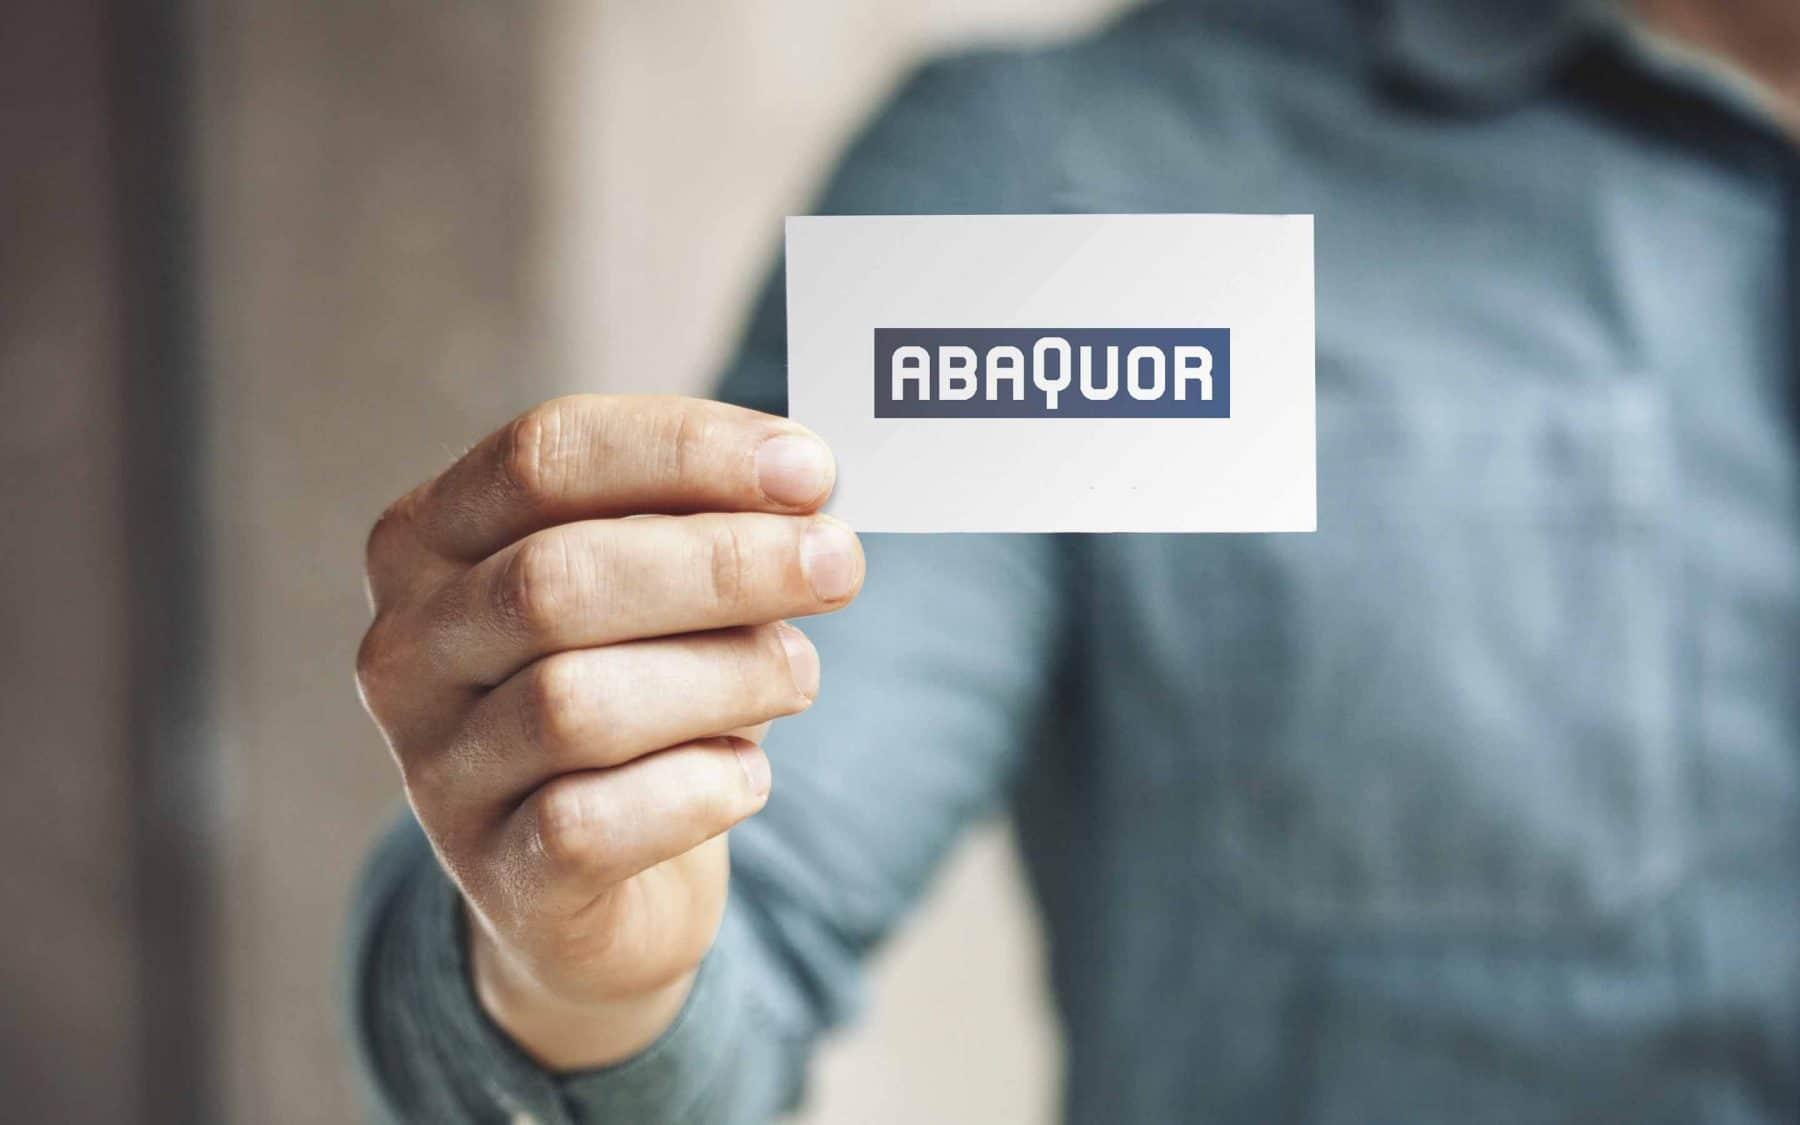 Abaquor 1